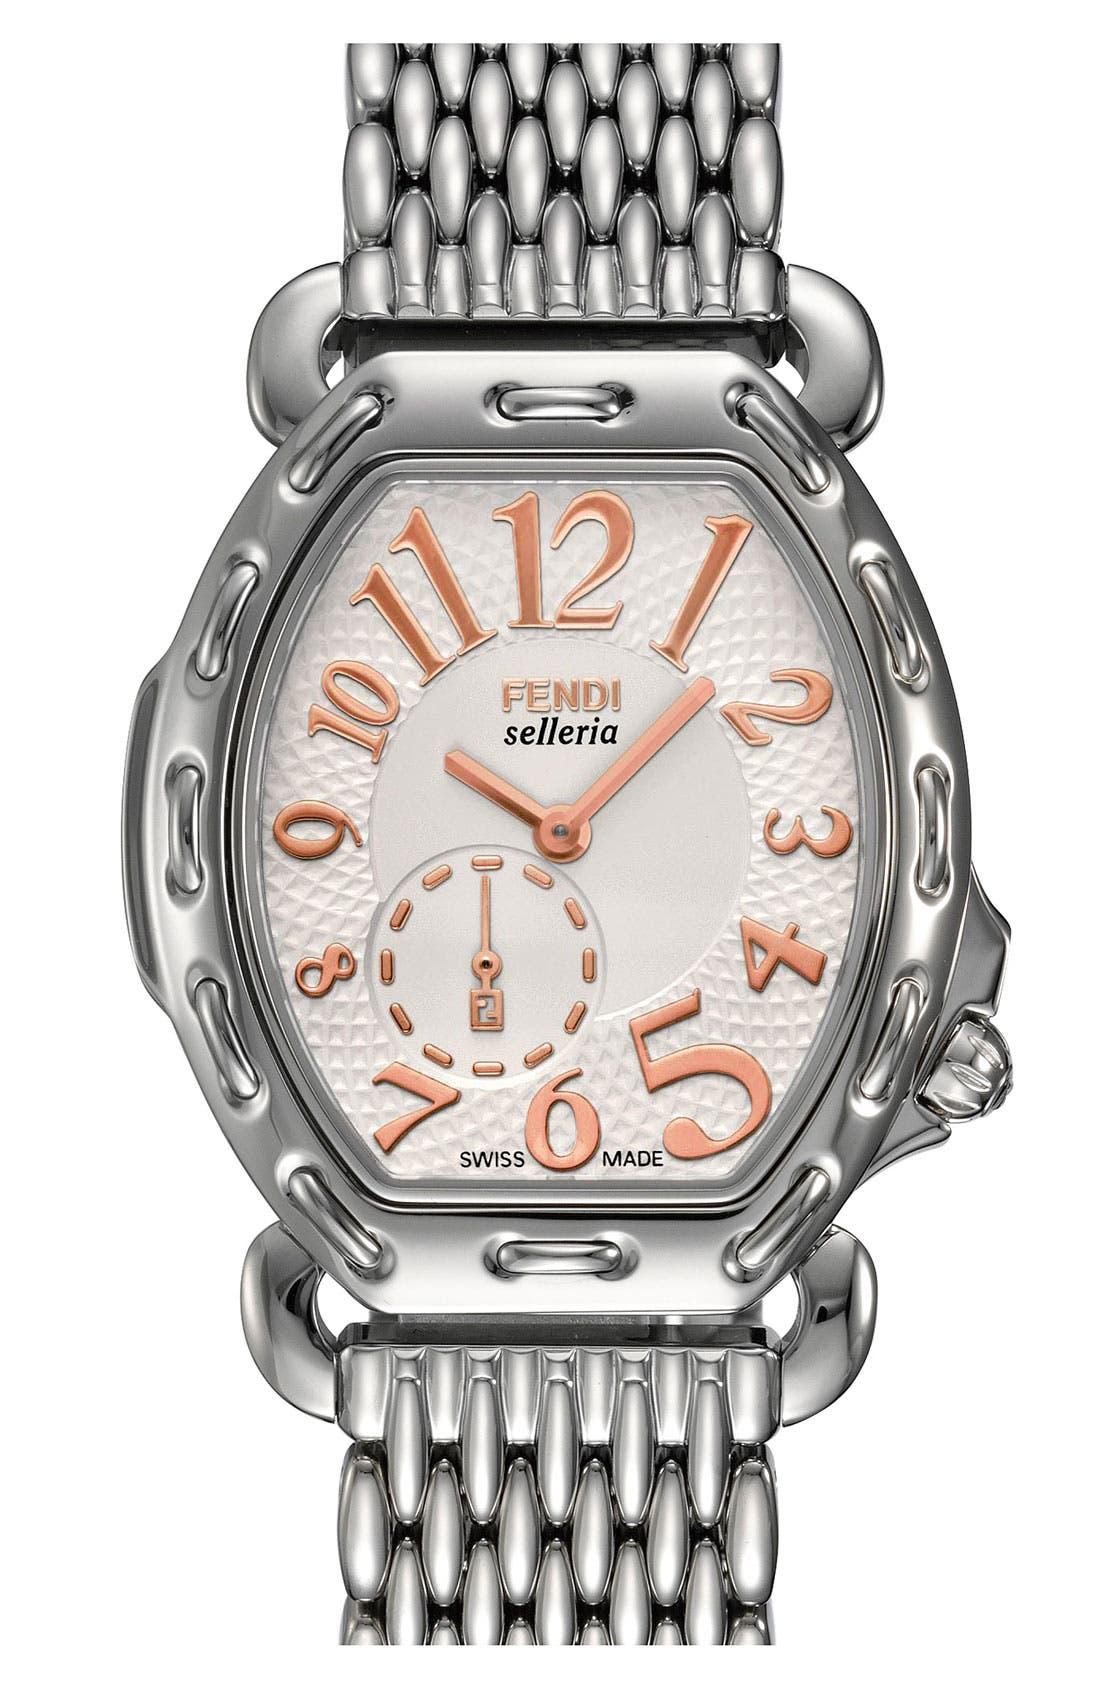 Alternate Image 2  - Fendi 'Selleria' Tonneau Watch Case, 33mm x 38mm